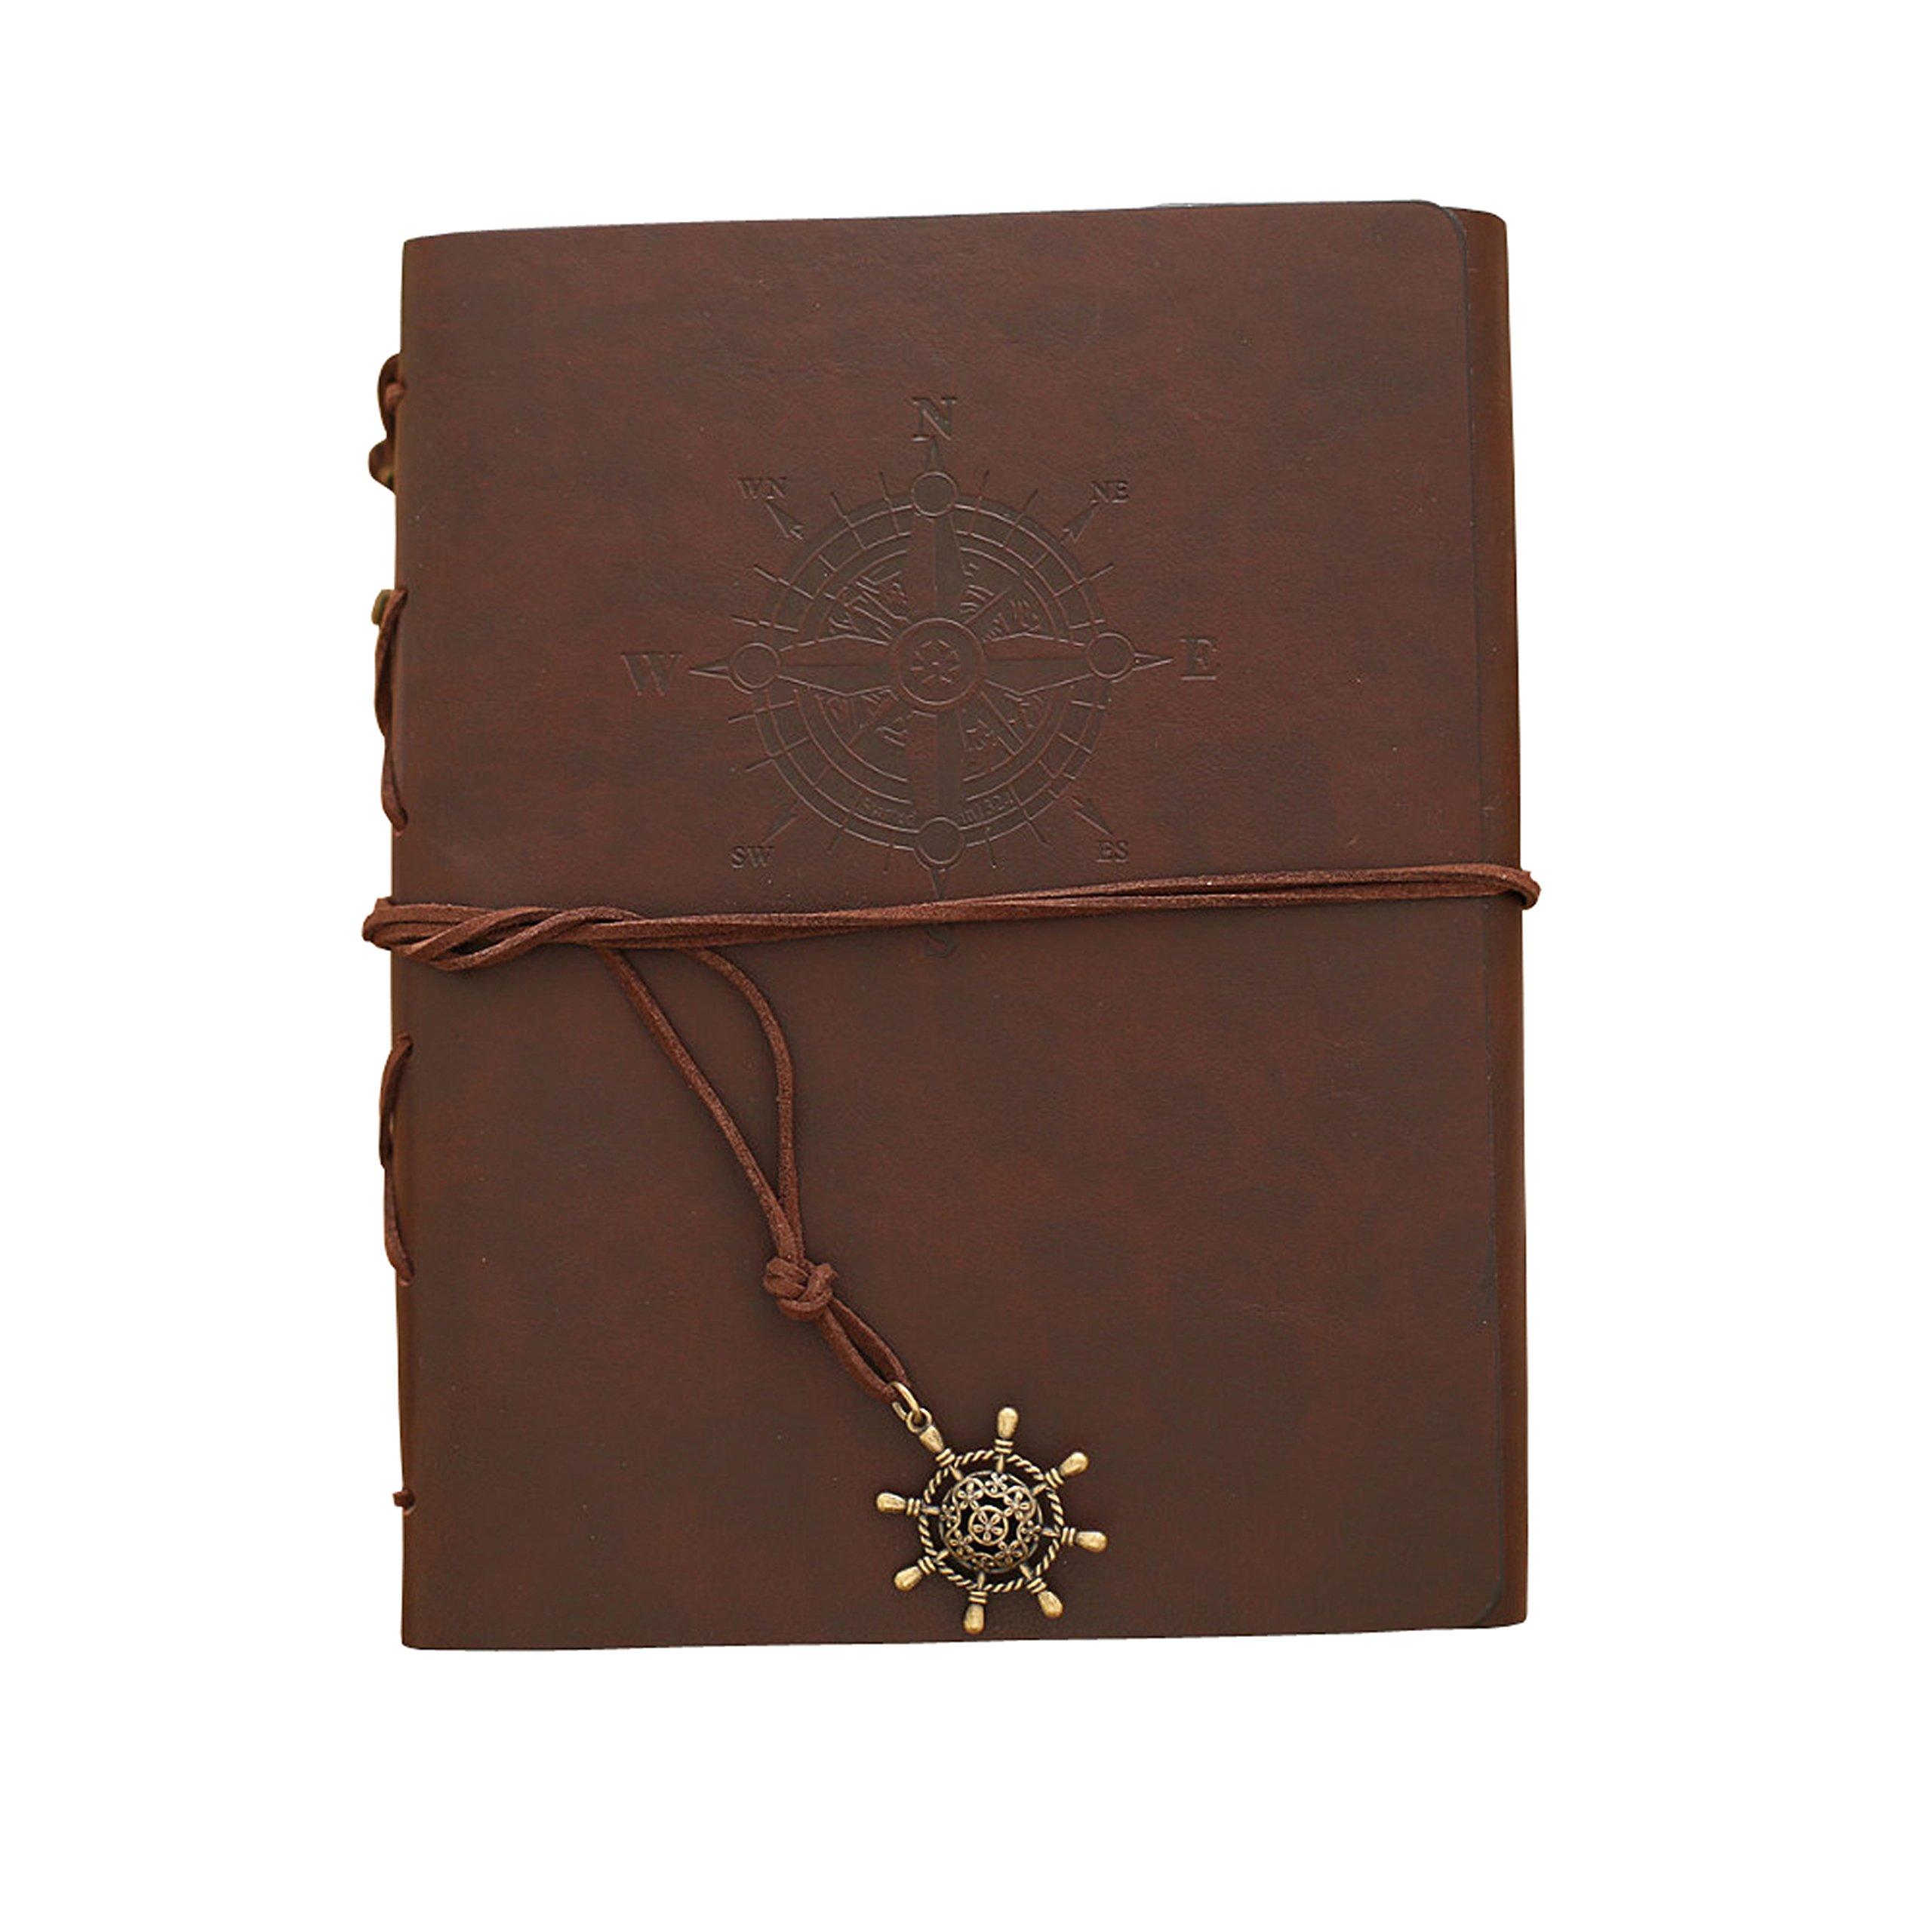 Zoview Adhesive Scrapbook Photo Album Memory Book , 60 Pages Hand Made DIY Albums ,Dark Brown